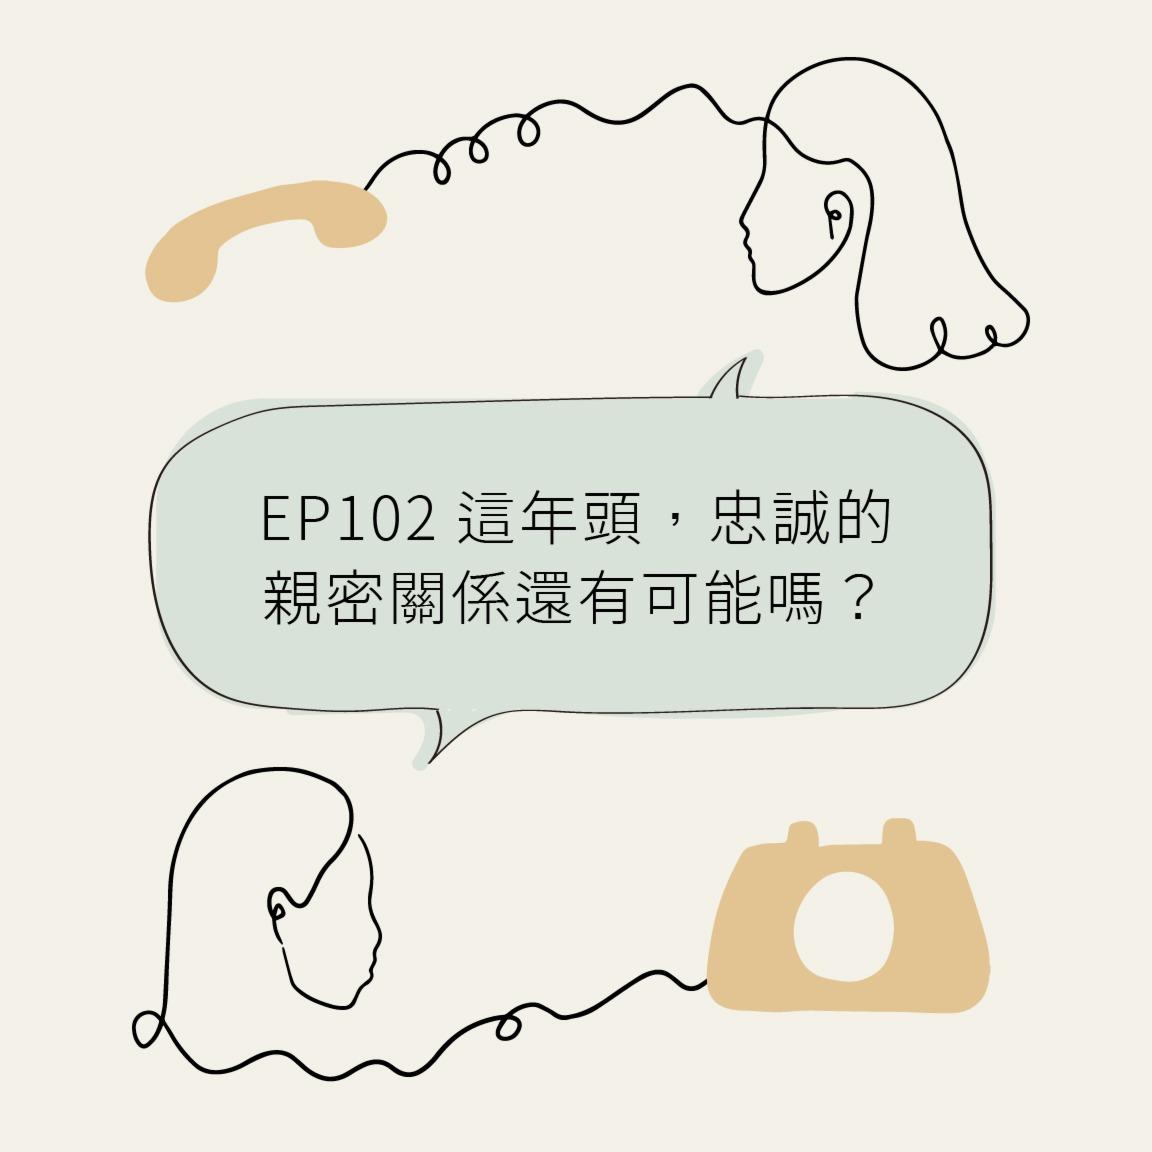 EP102 这年头,忠诚的亲密关系还有可能吗?